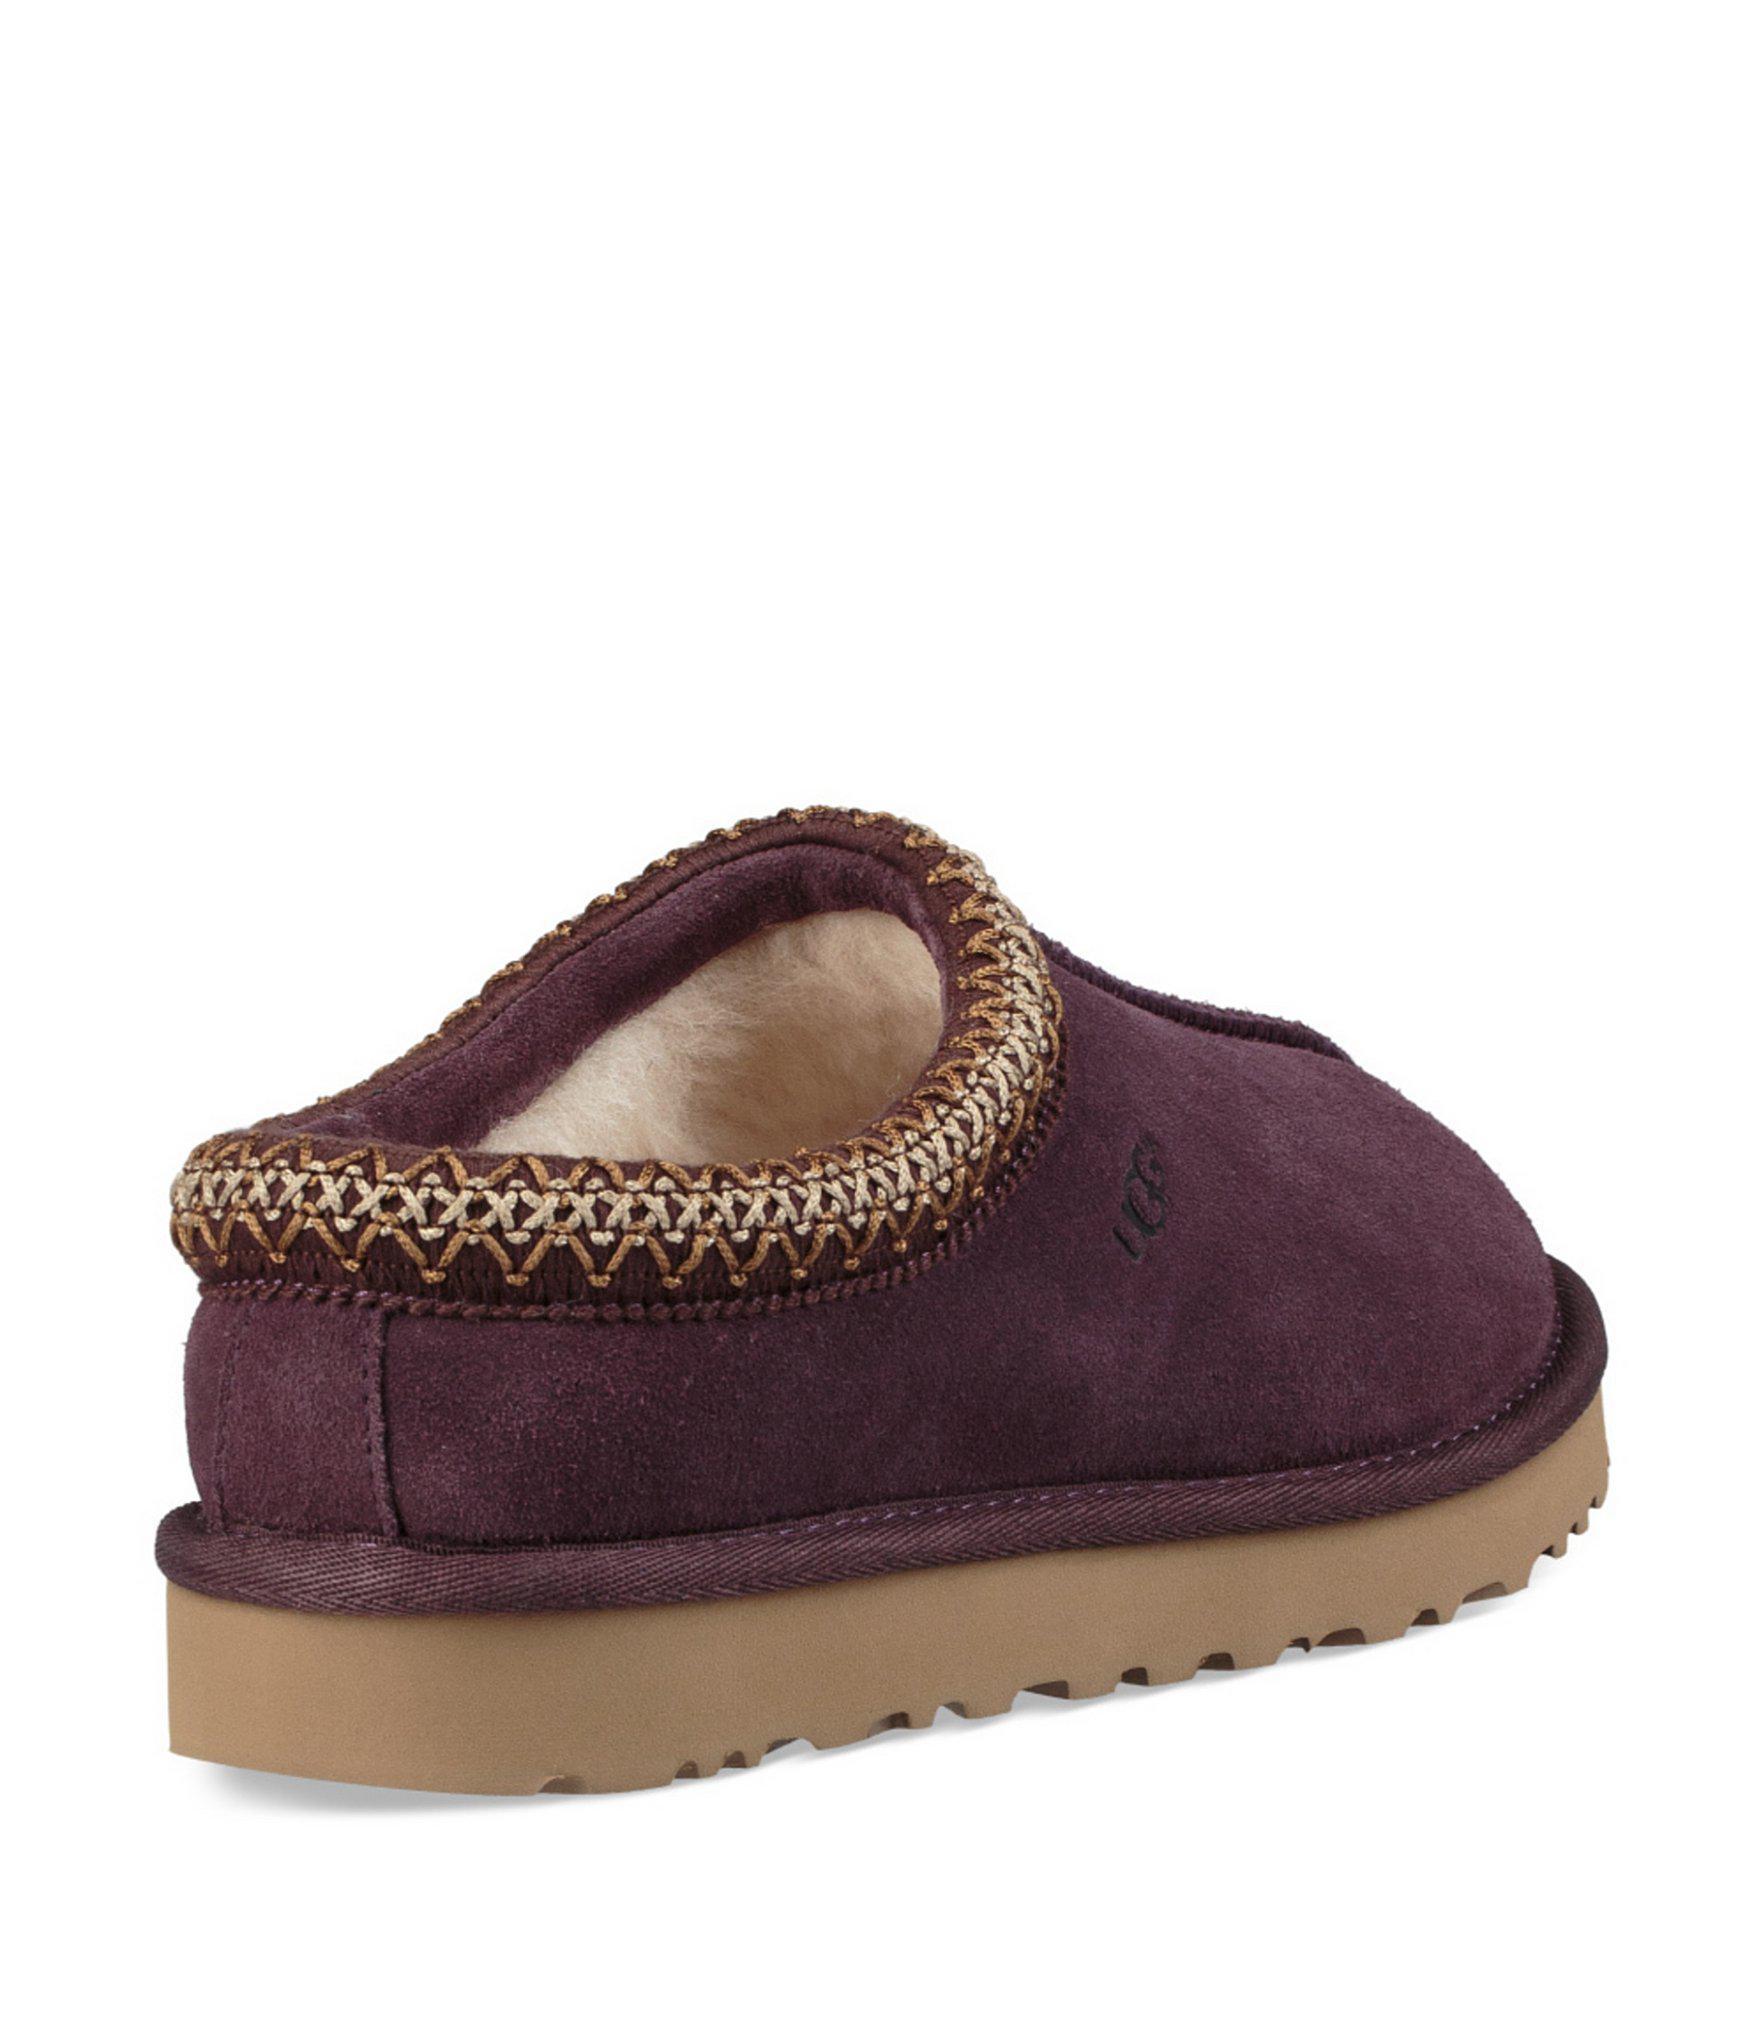 010eaa05479 Ugg Multicolor Women's Tasman Slippers